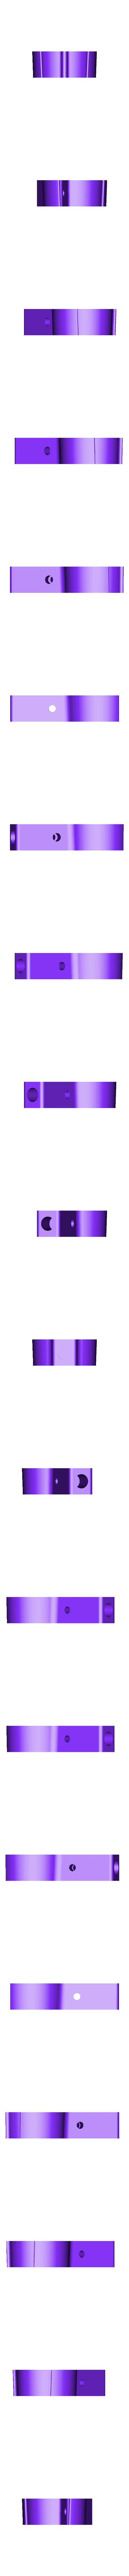 Bracket_Microscope.STL Télécharger fichier STL gratuit Support de microscope • Plan imprimable en 3D, perinski